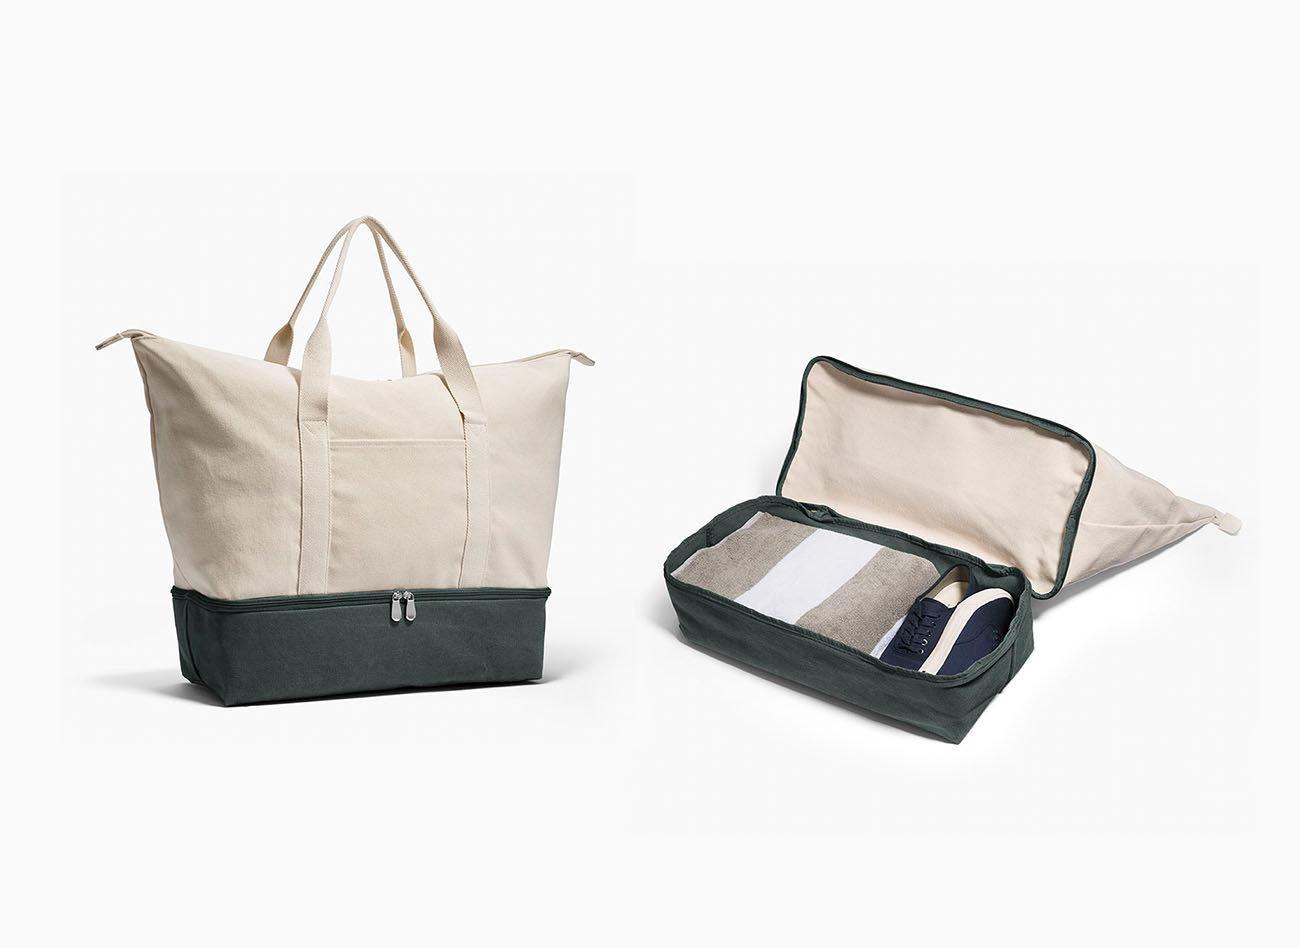 Travel Shop Travel Tech bag white handbag fashion accessory product product design beige shoulder bag brand leather